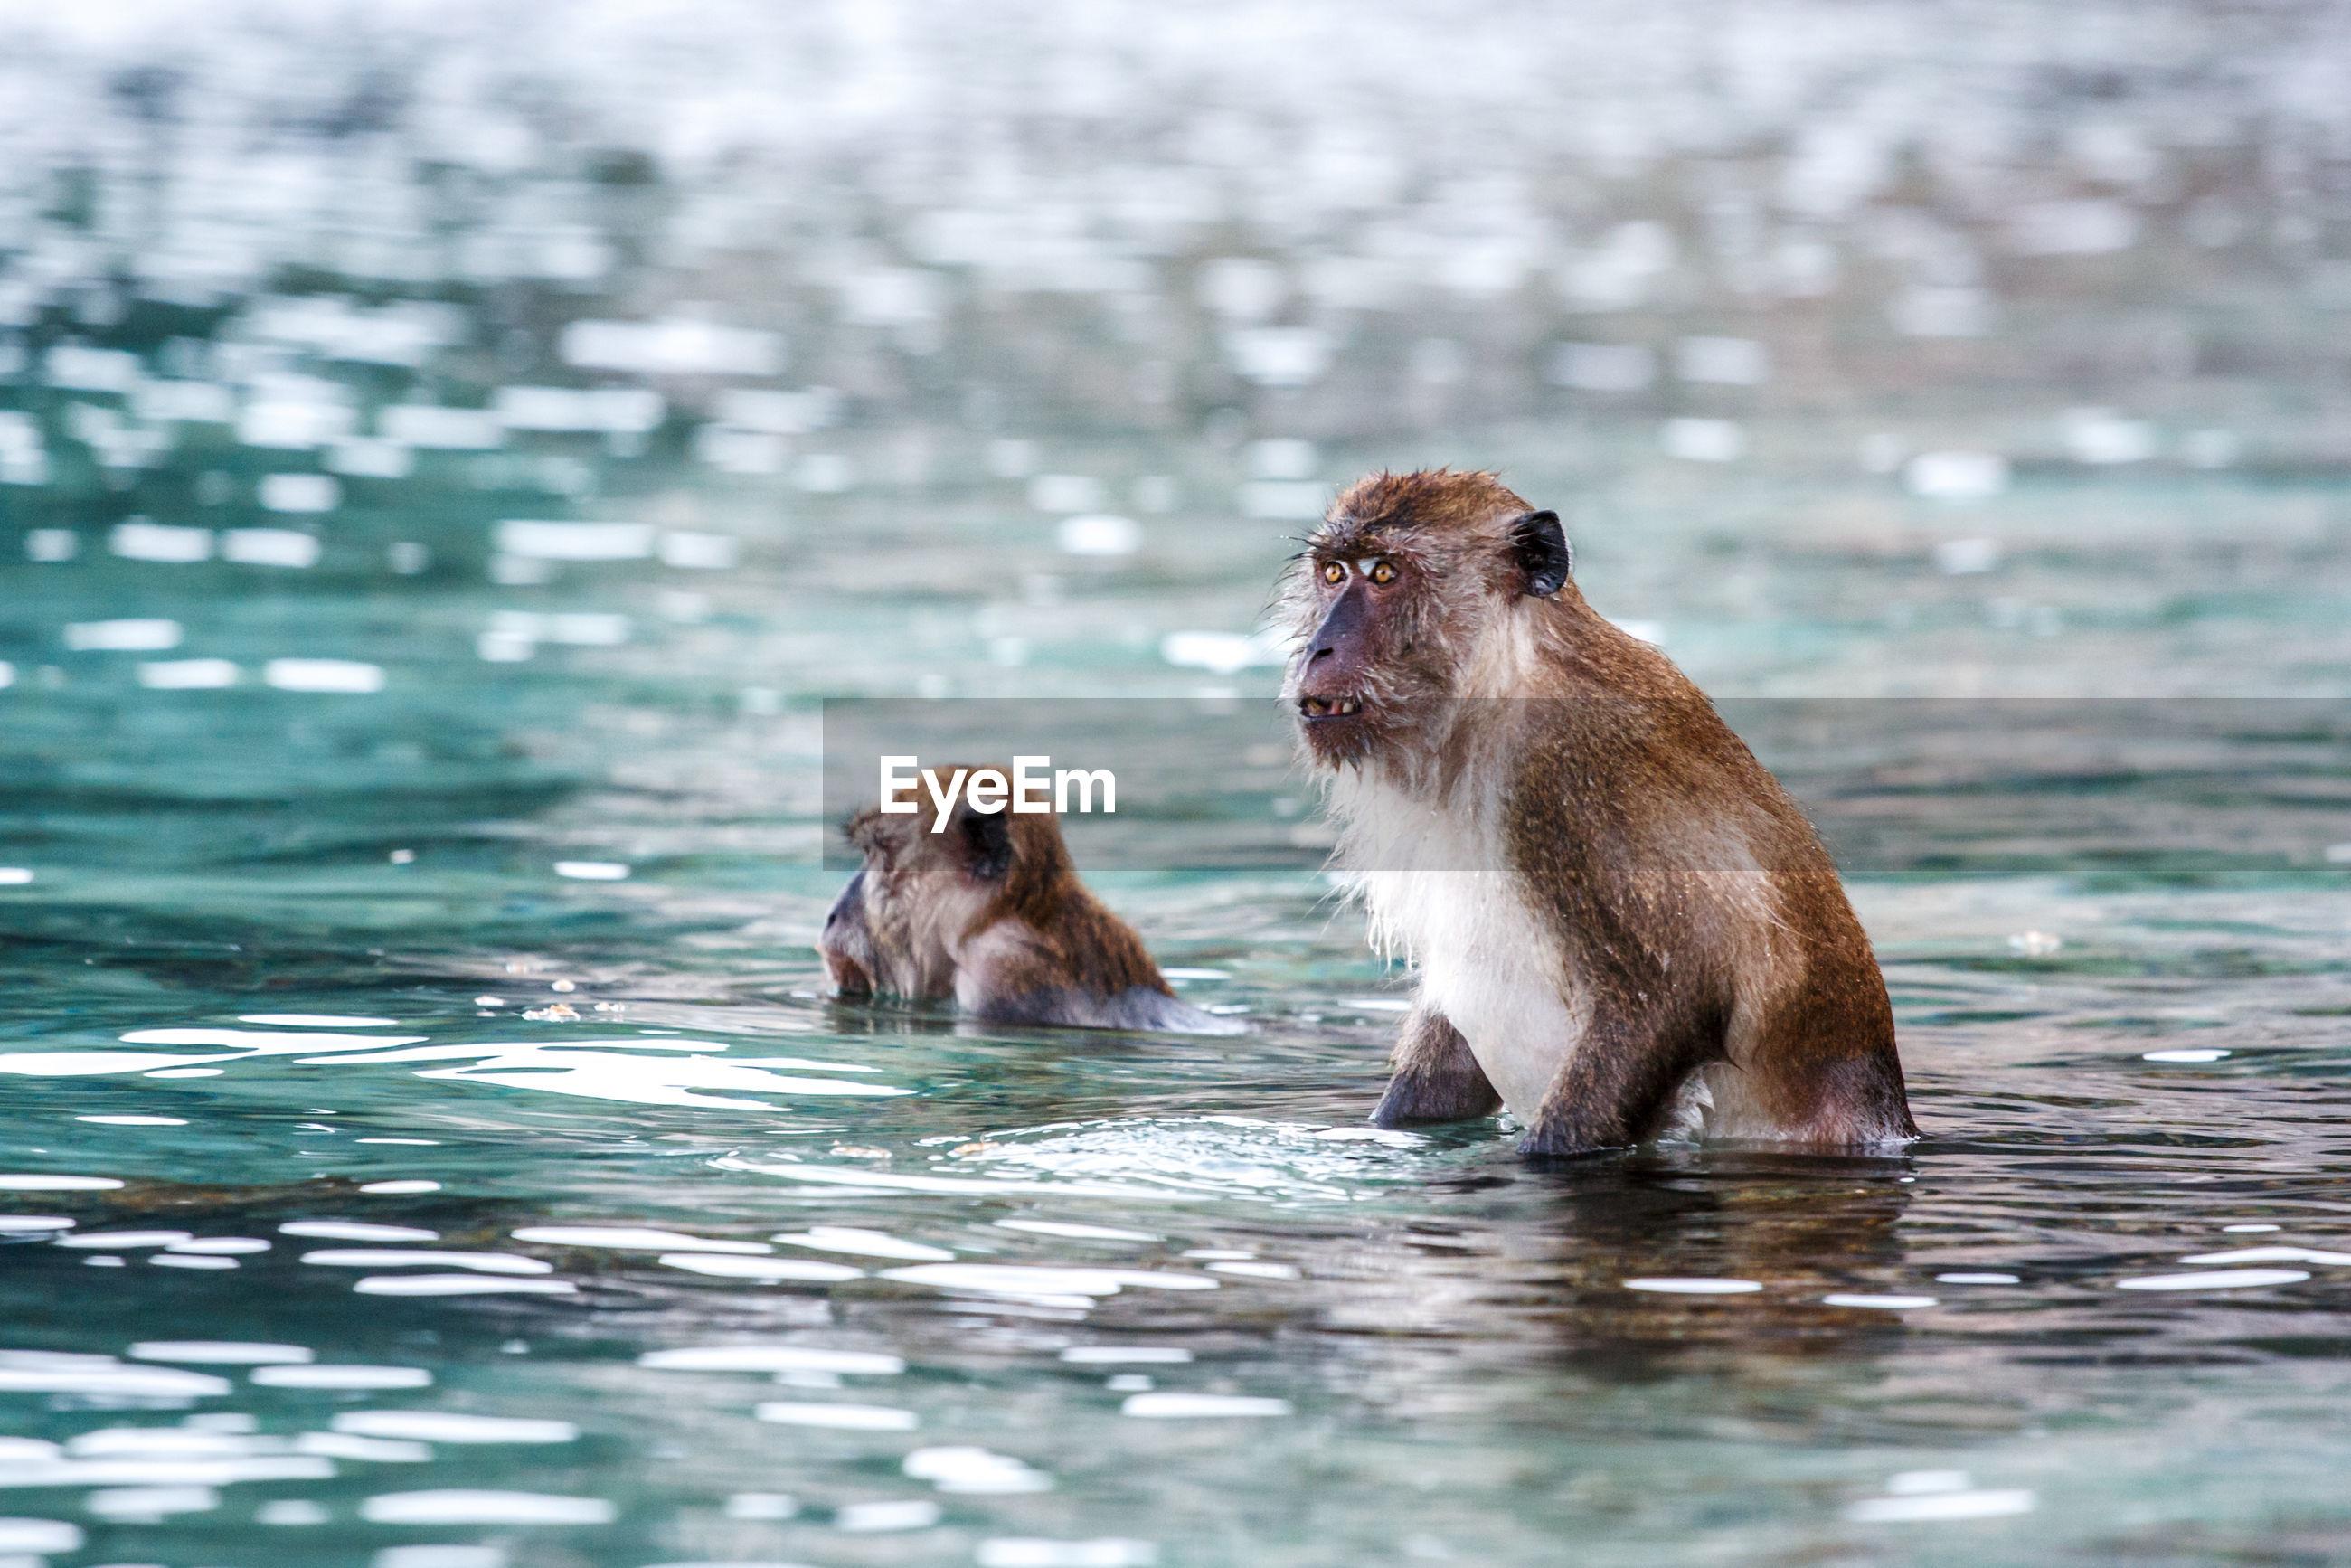 Monkeys swimming in lake